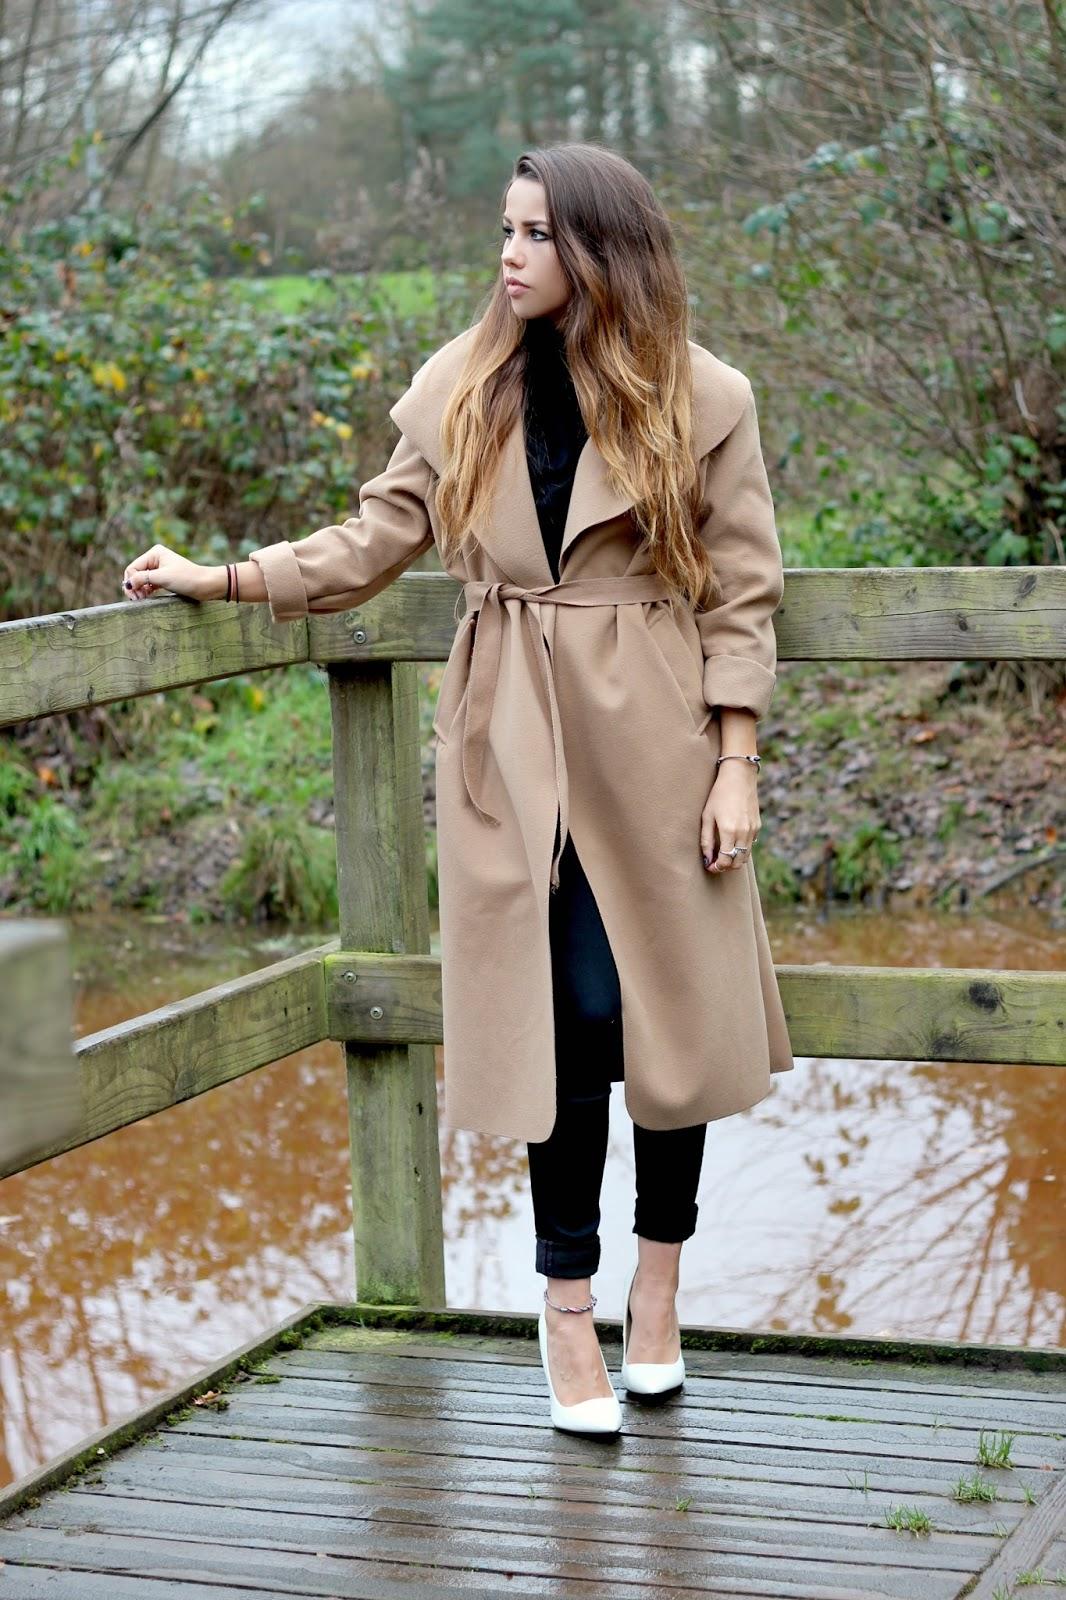 copper-garden-fashion-blogger-personal-style-london